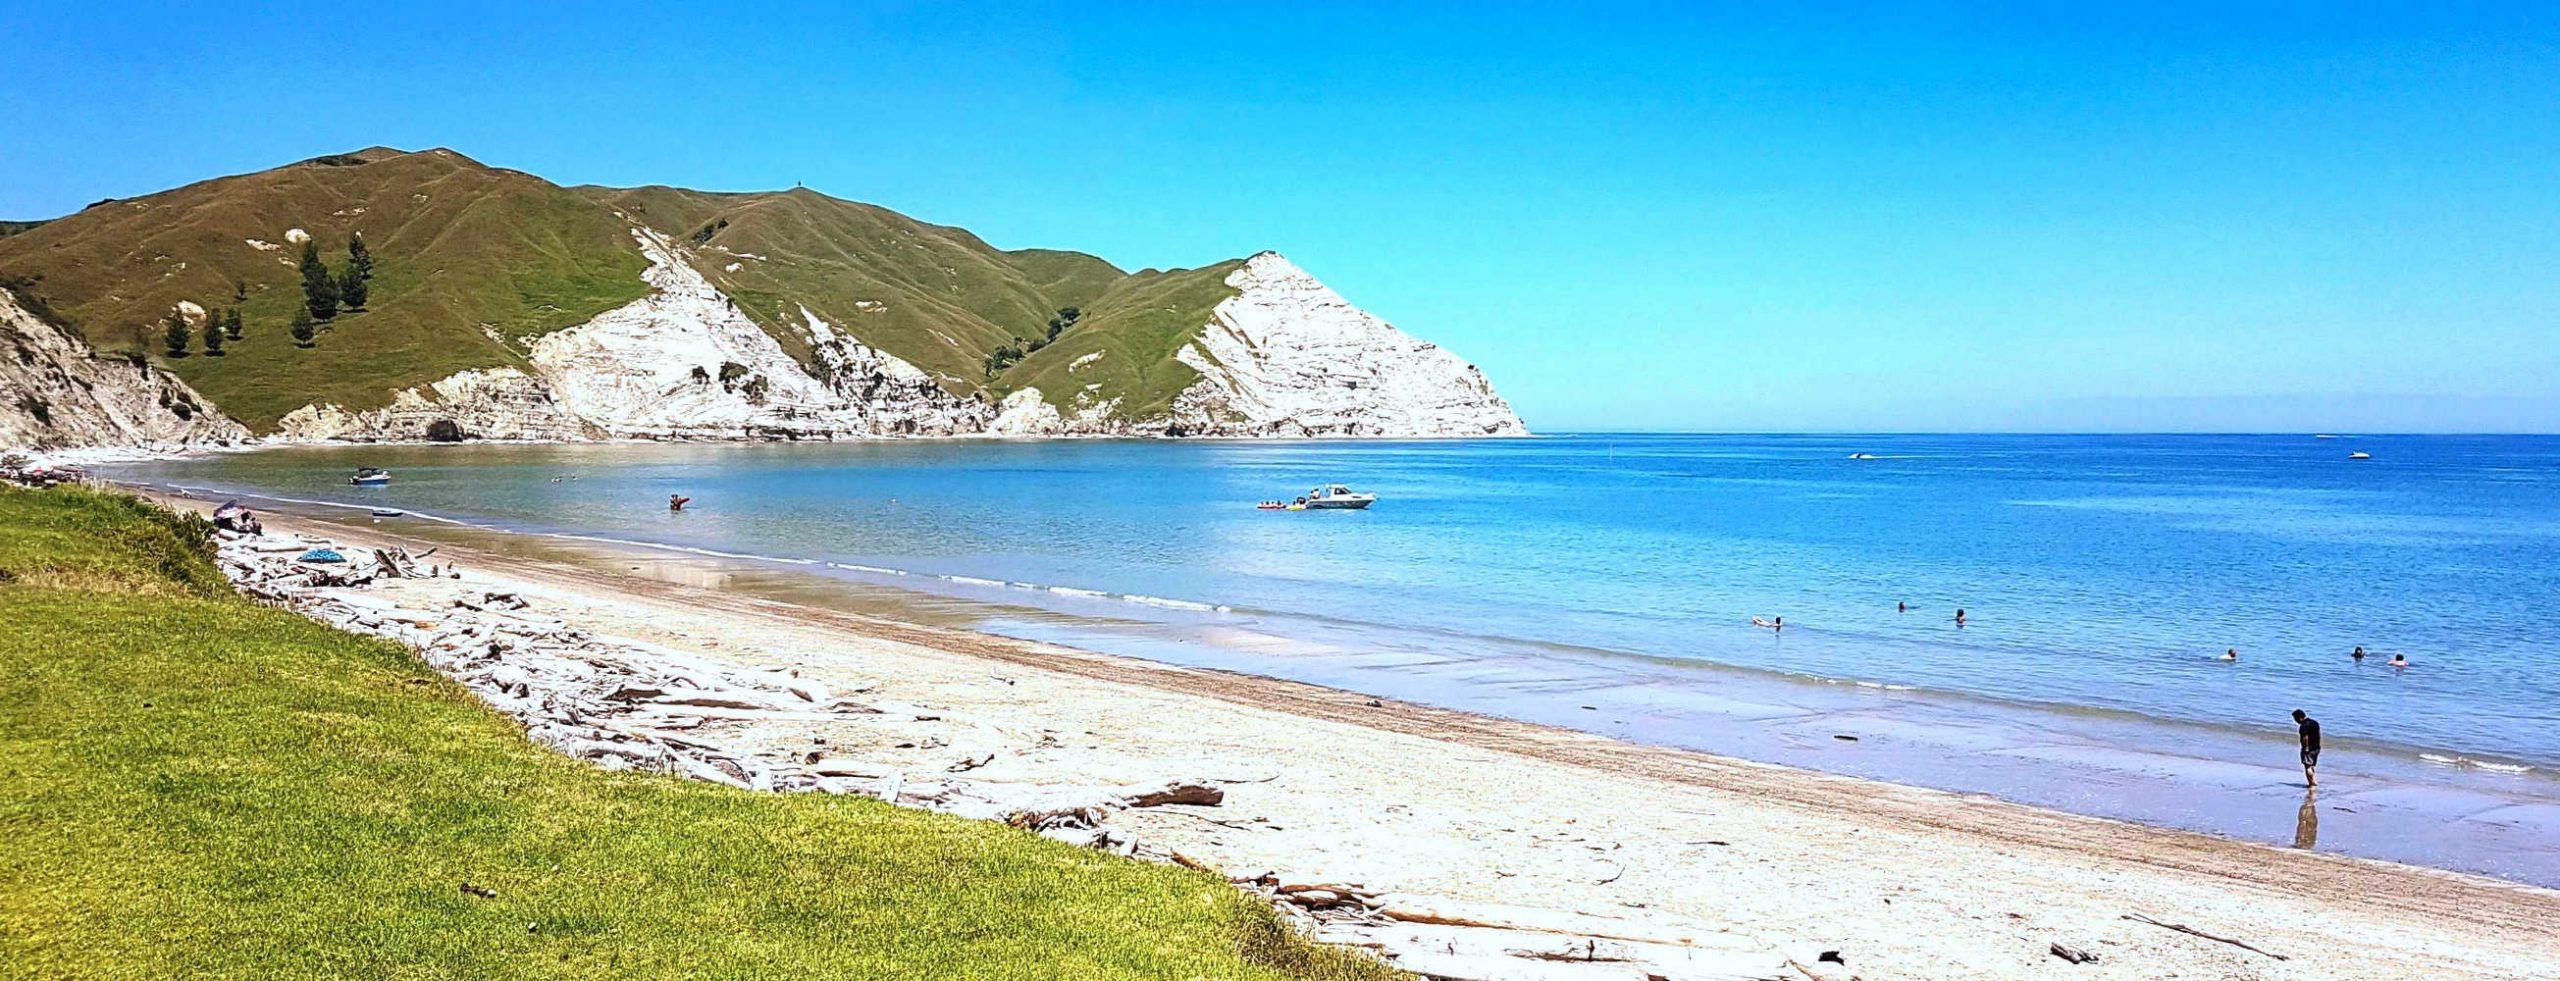 Mahia Peninsula white limestone cliffs,New Zealand